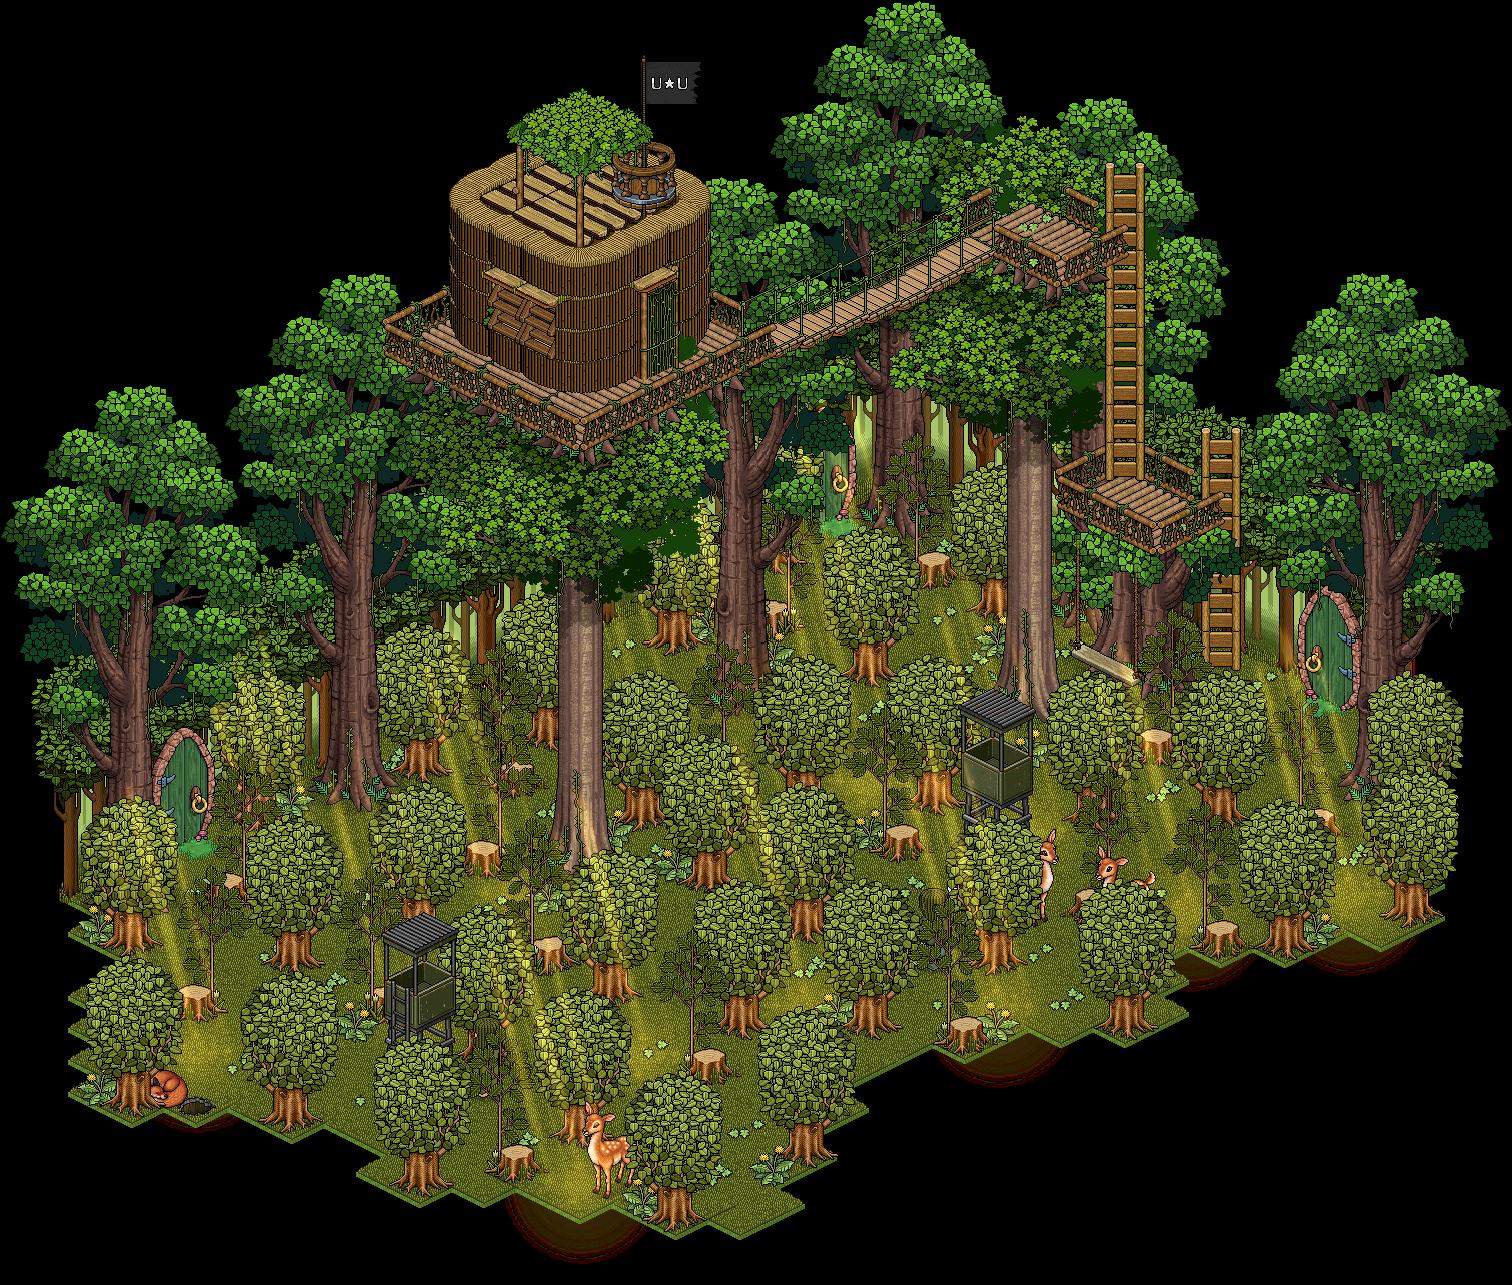 U¥U La Forêt de Brocéliande